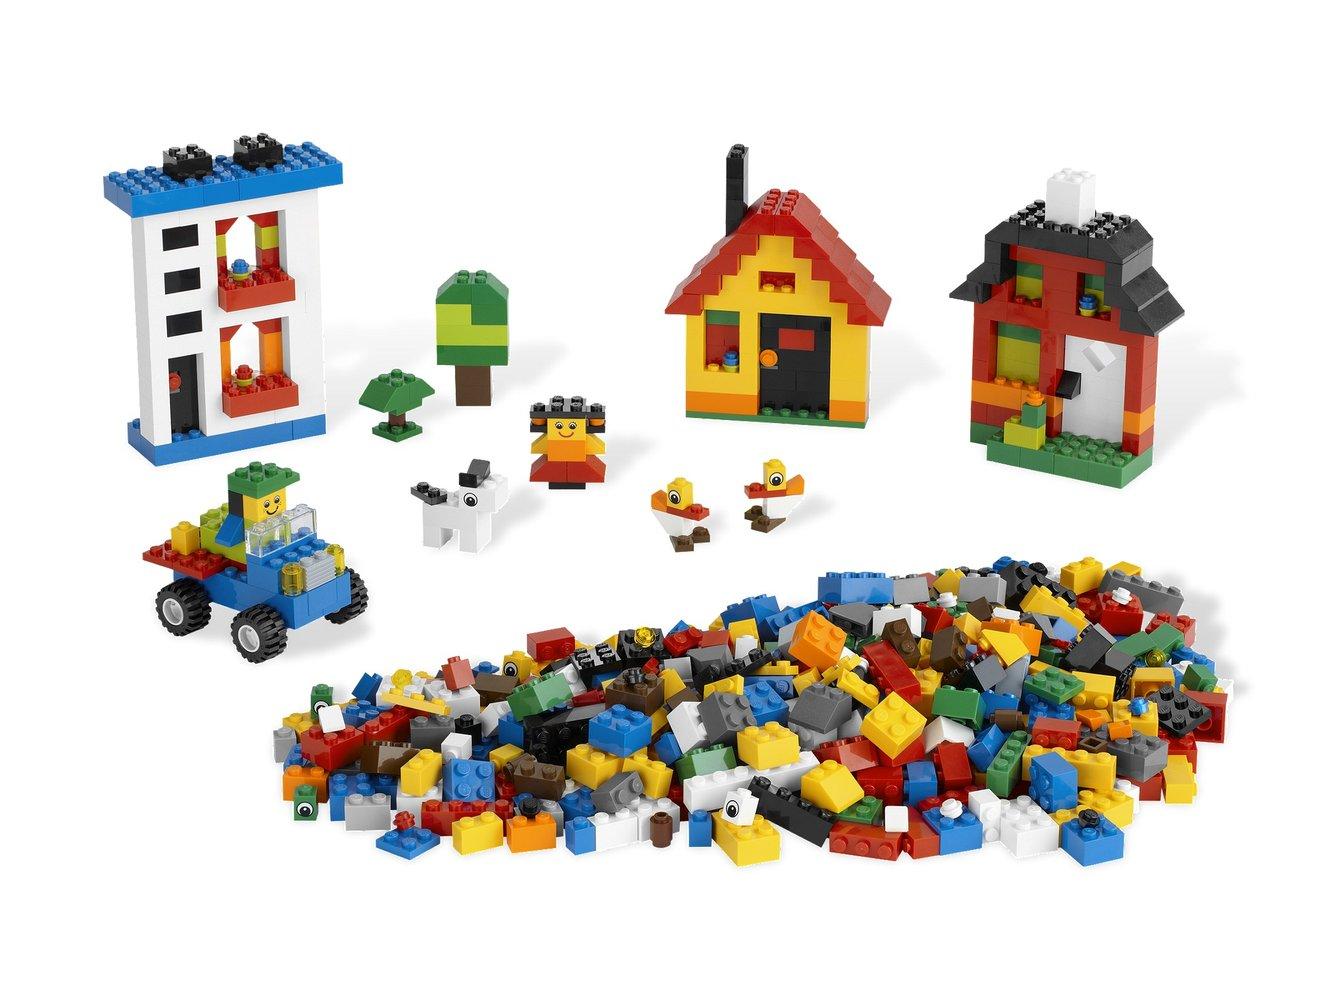 Creative Building Kit